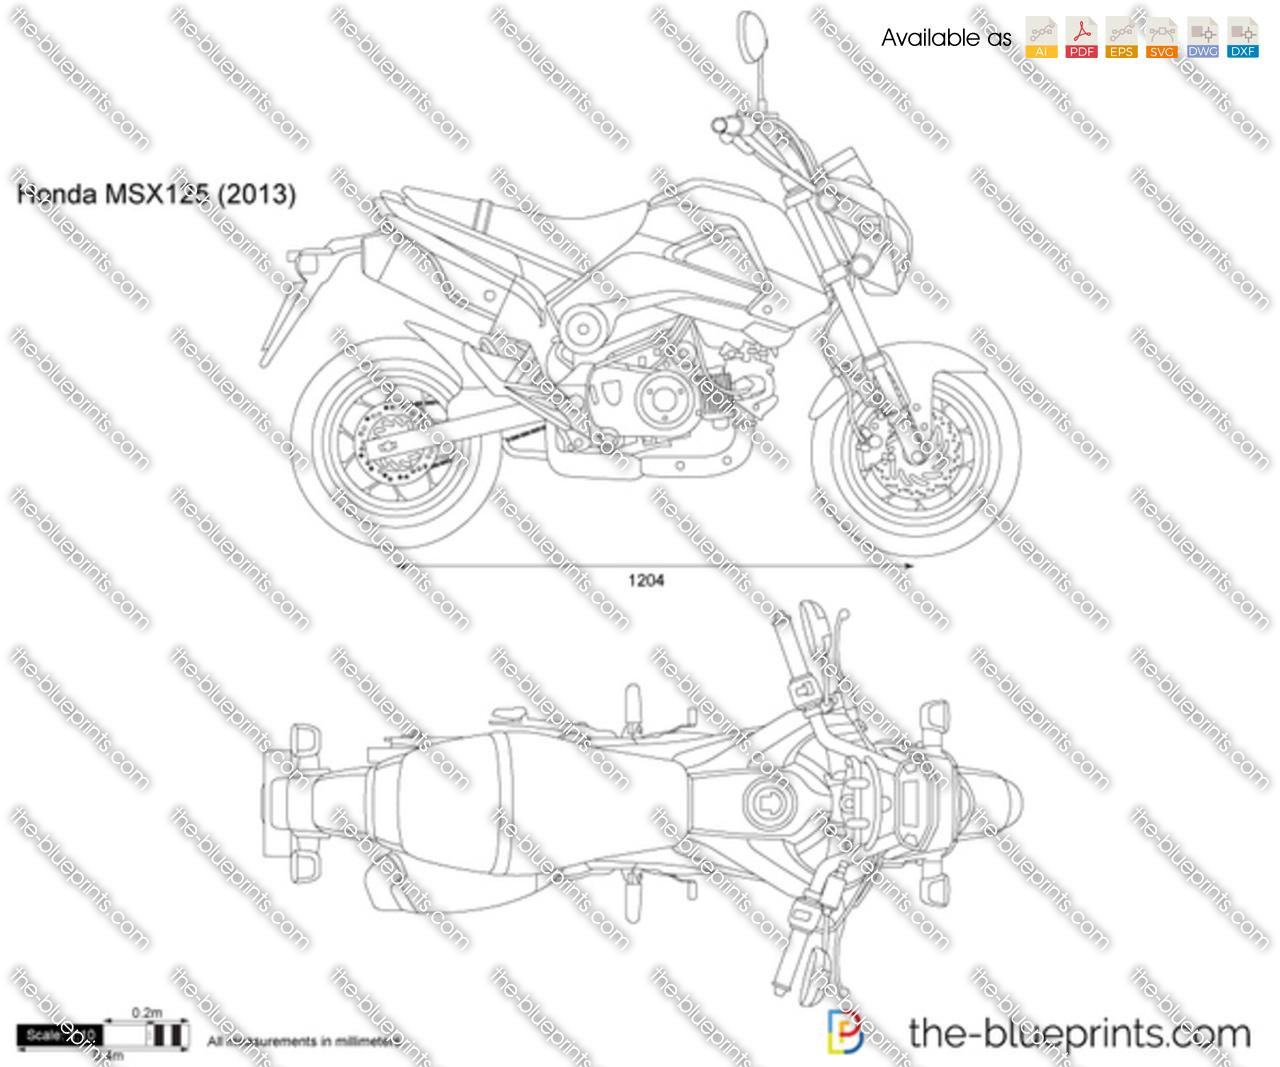 Honda MSX125 2014